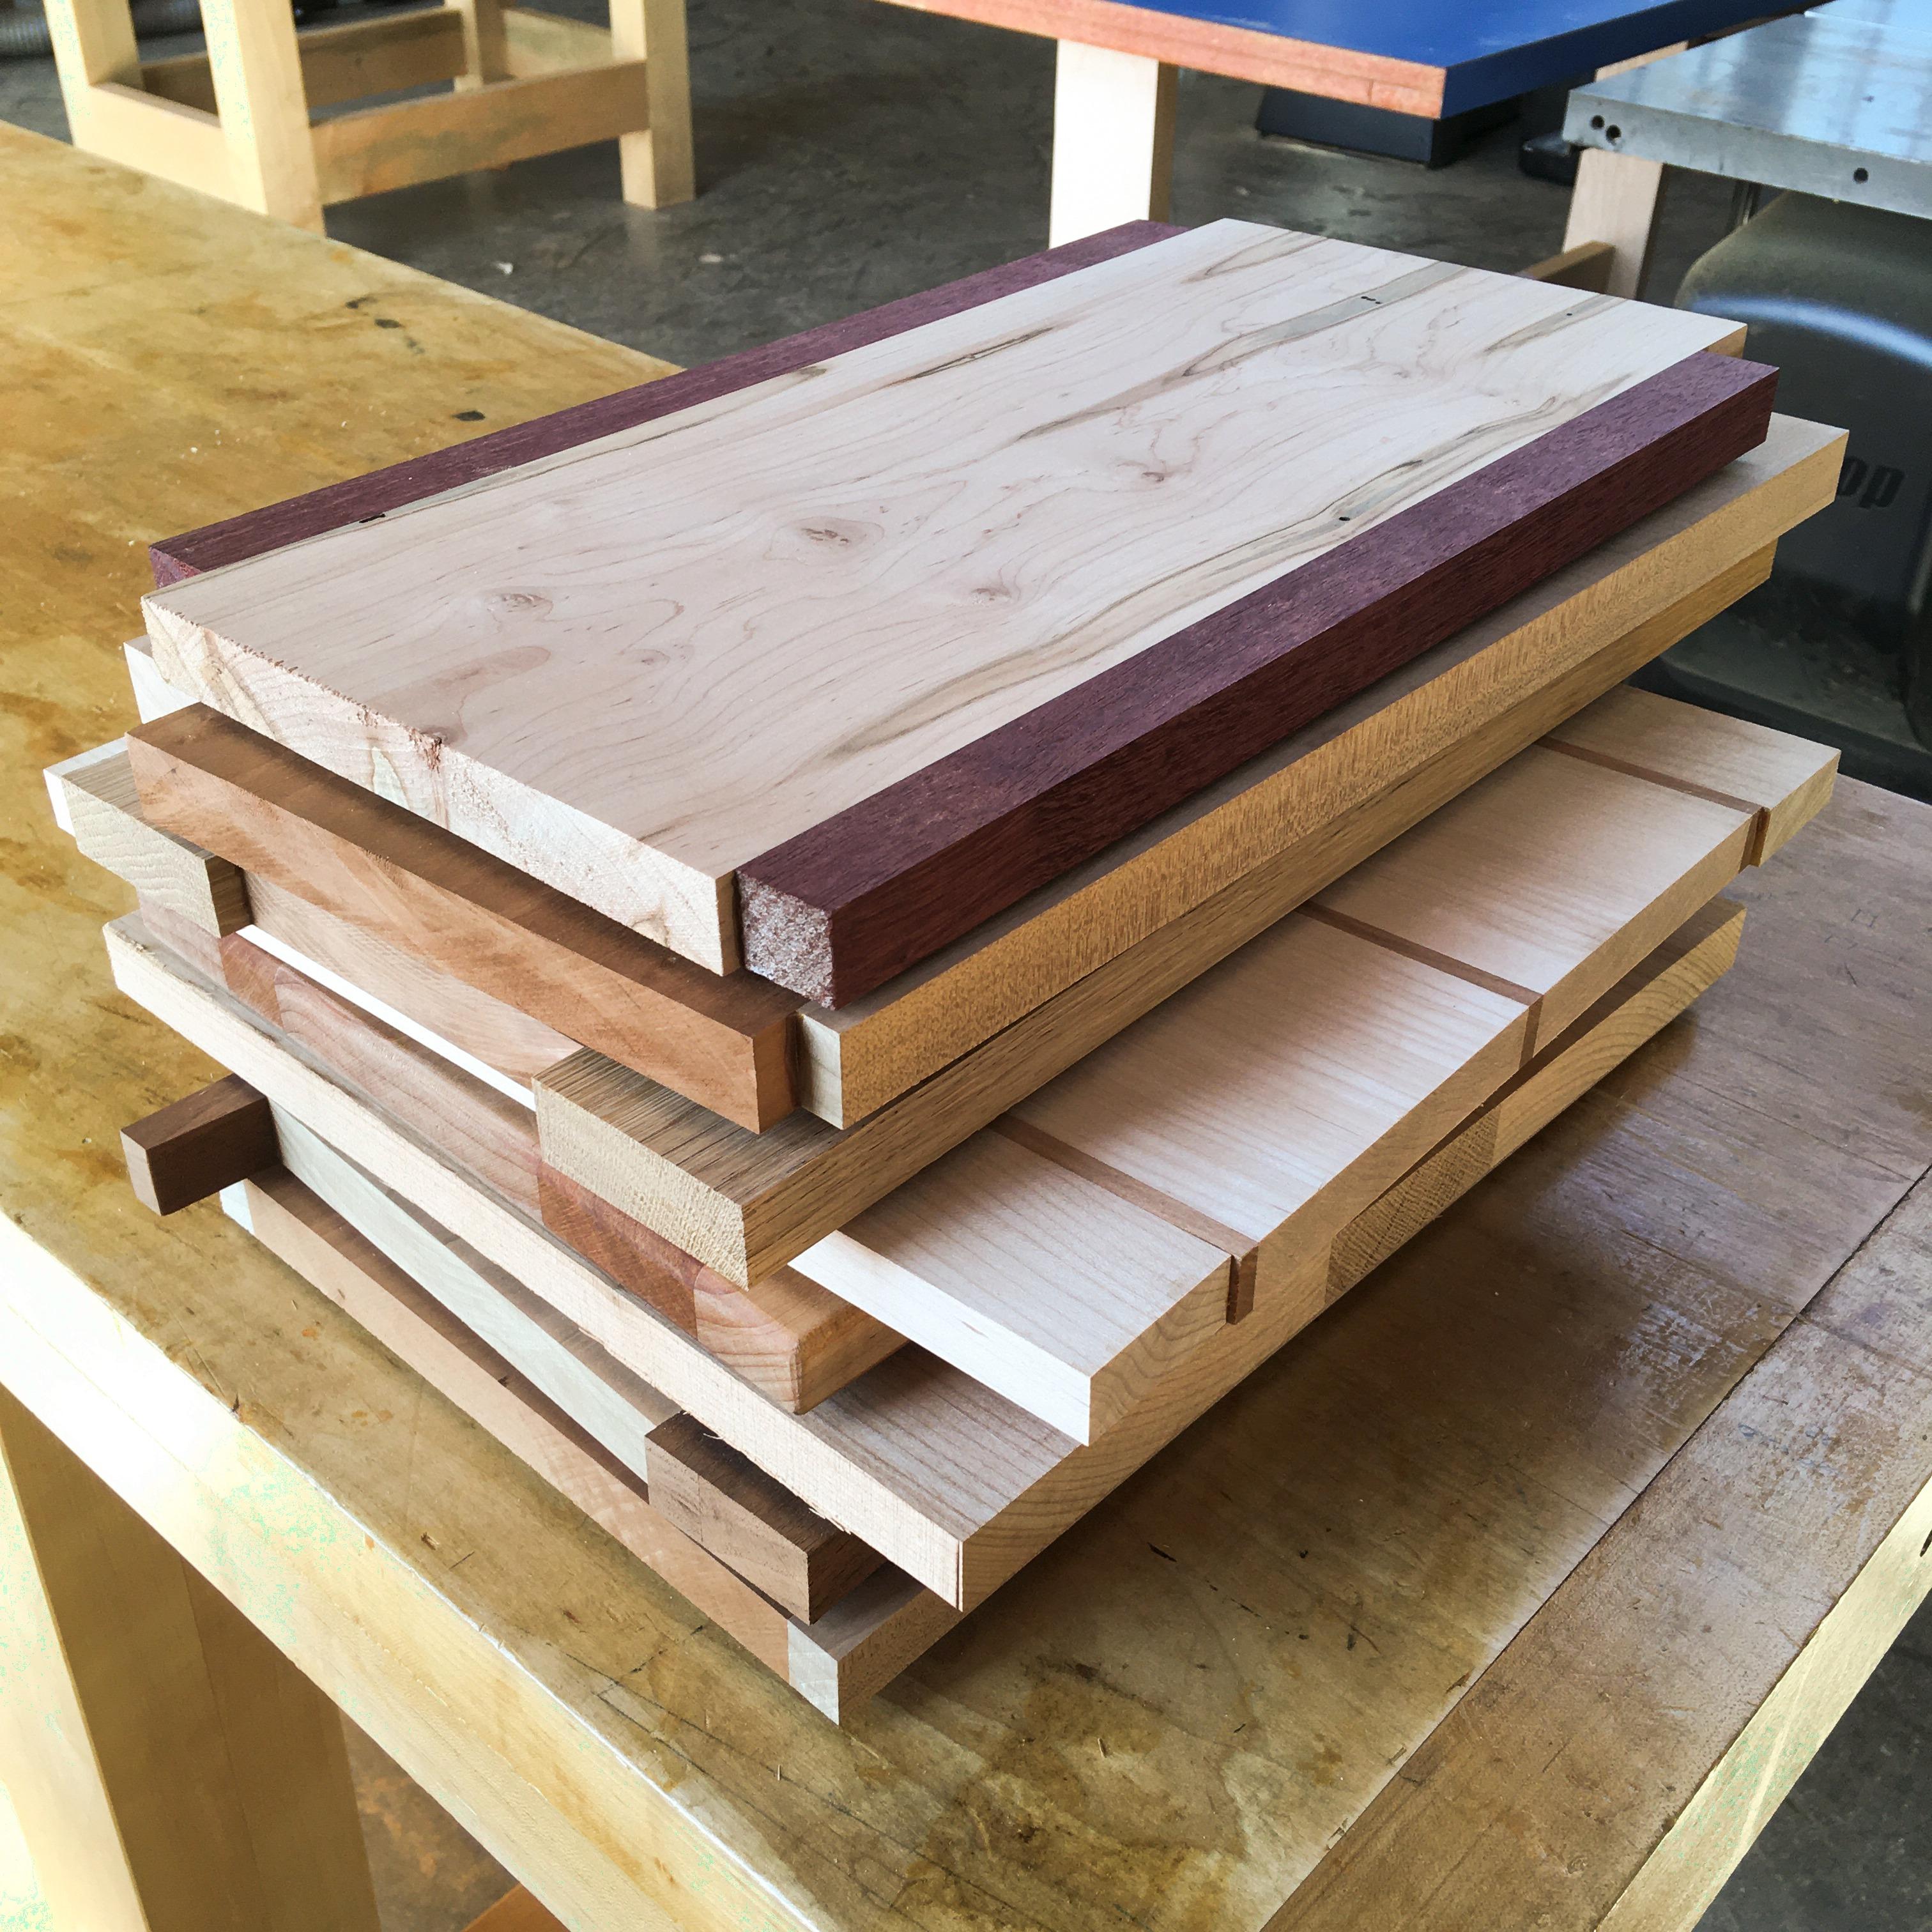 Class Image Taste of Art - Cutting Boards